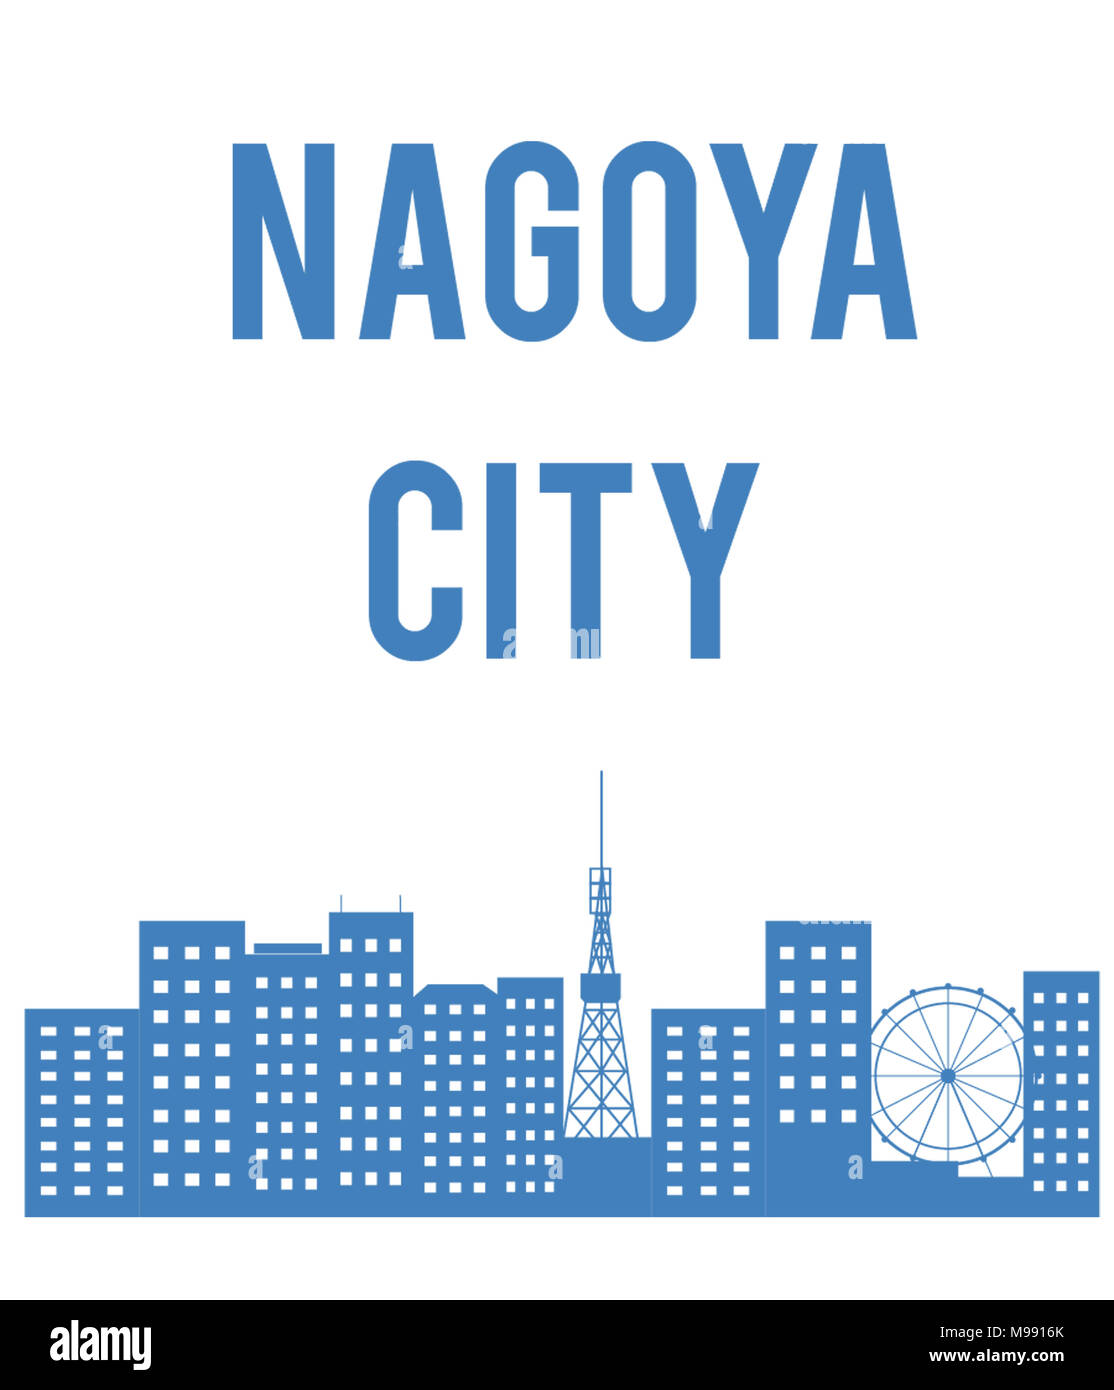 nagoya city japan - Stock Image